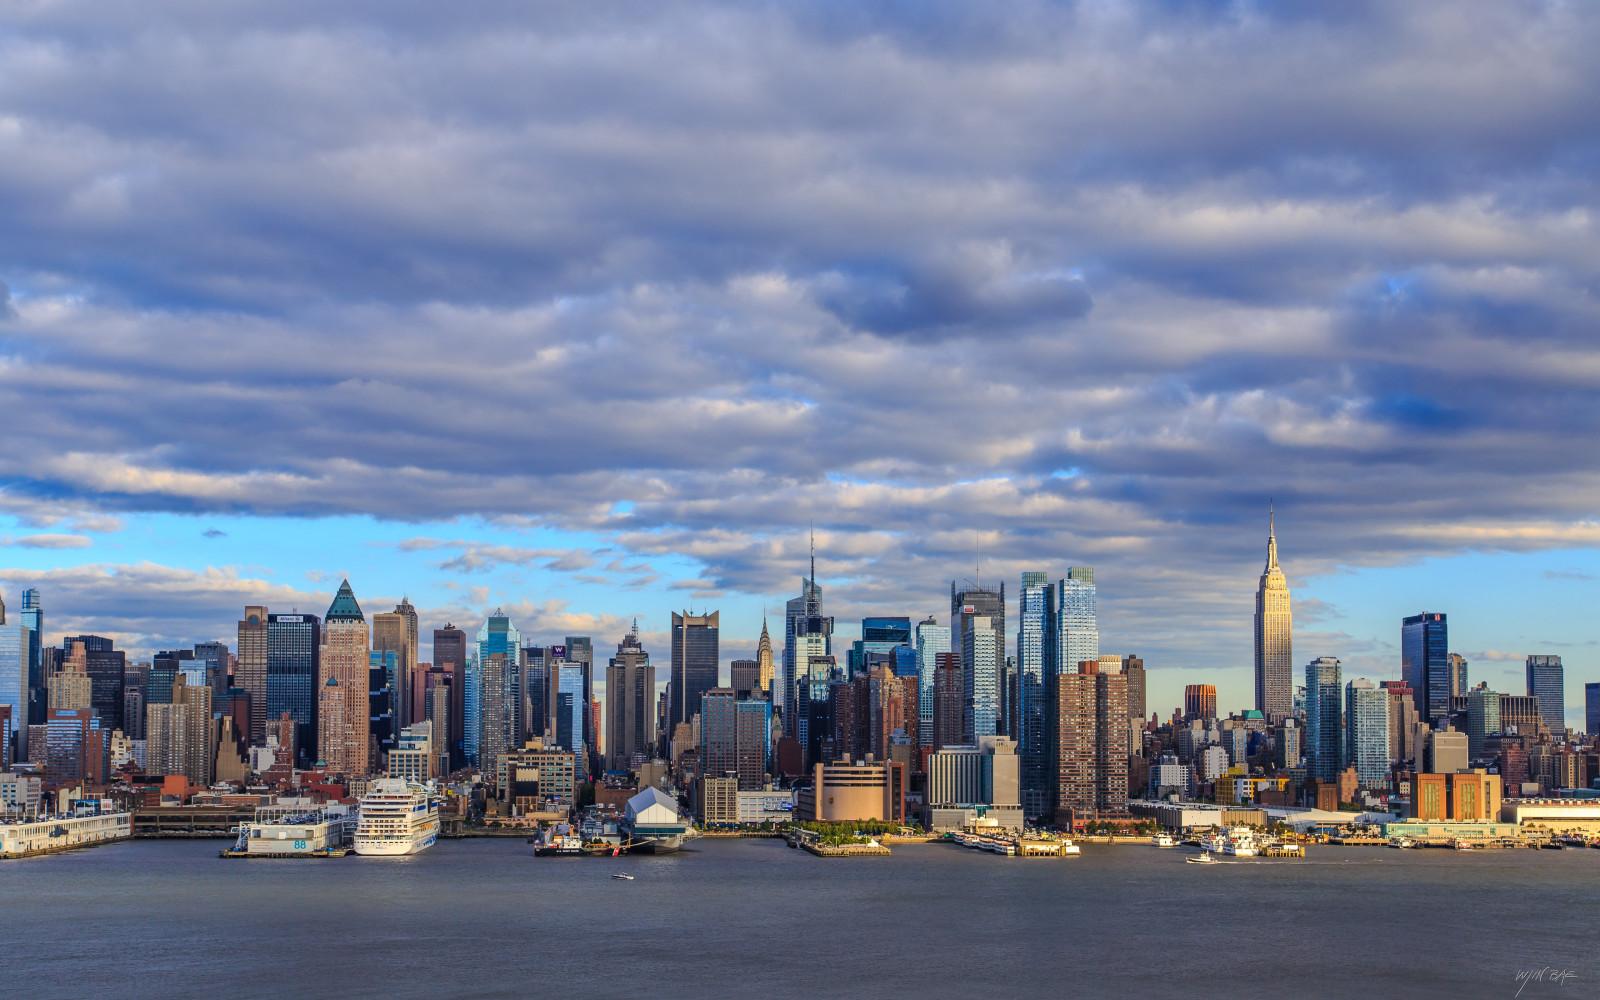 Wallpaper sea city cityscape building sky clouds skyline skyscraper evening new york - 5120x3200 resolution ...